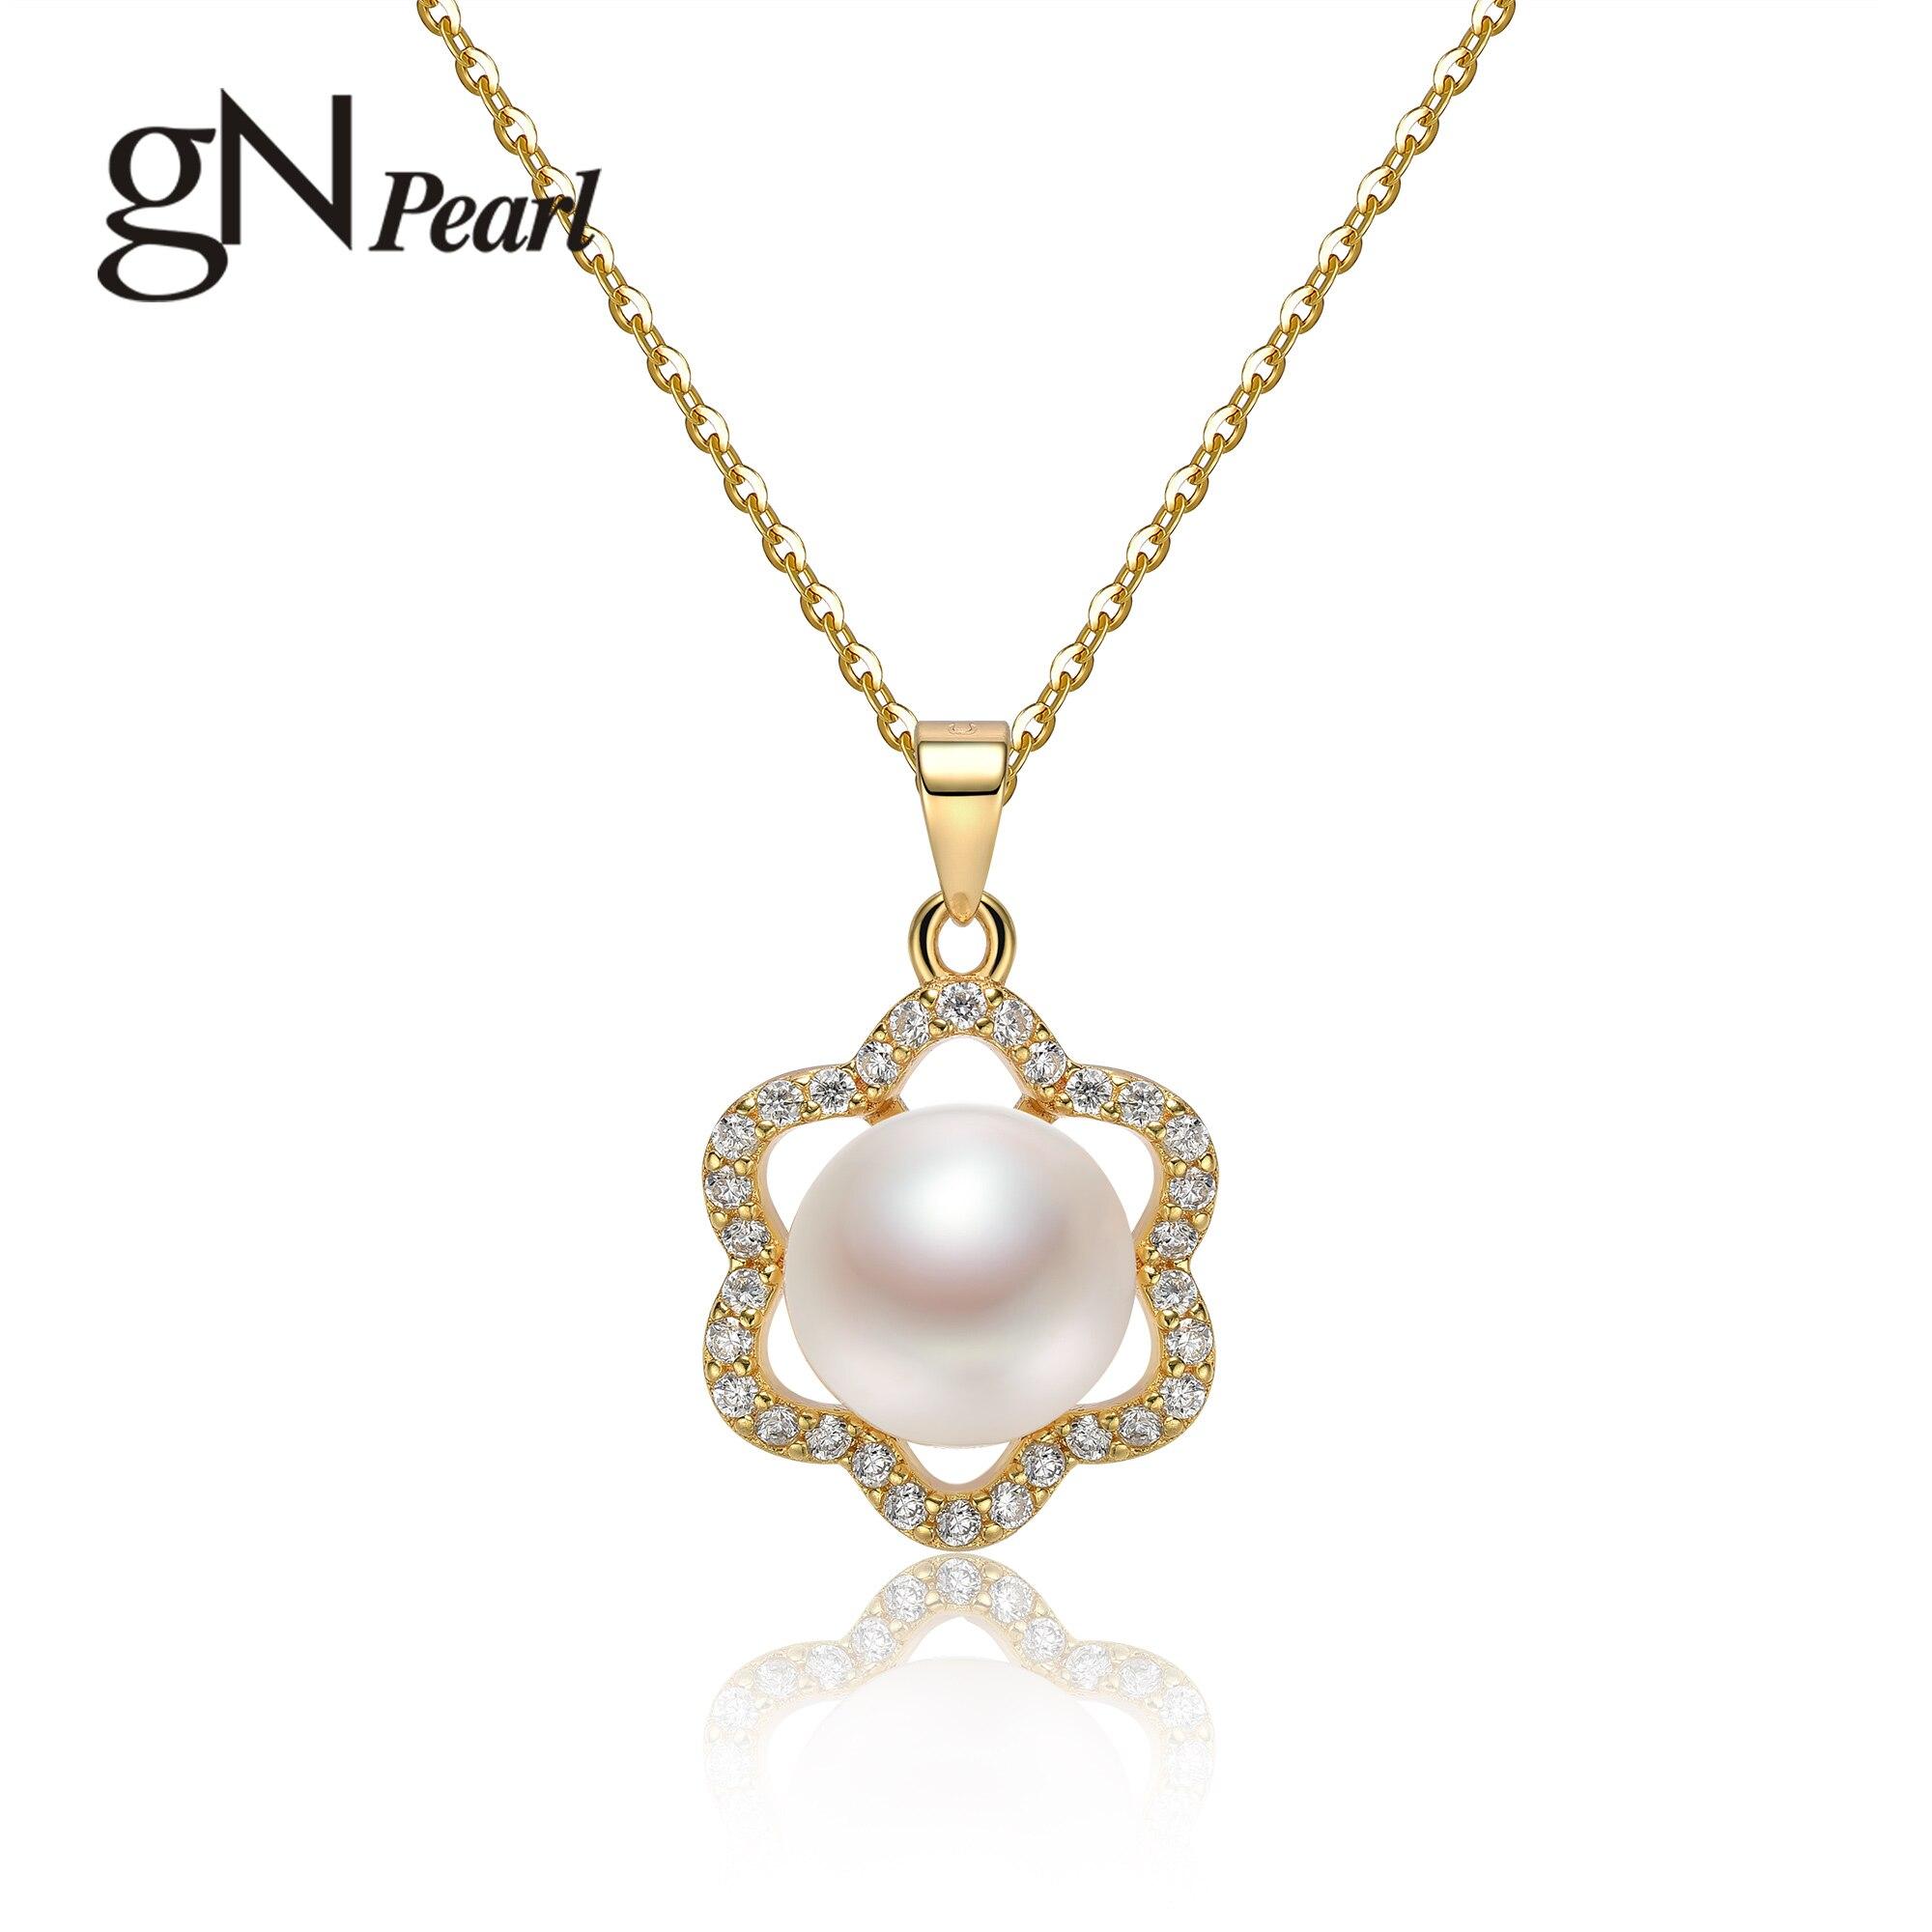 Gn pérola branco de água doce natural 8-9mm pérola pingentes colares 925 prata banhado a ouro flor zircônia gargantilha corrente gnpearl